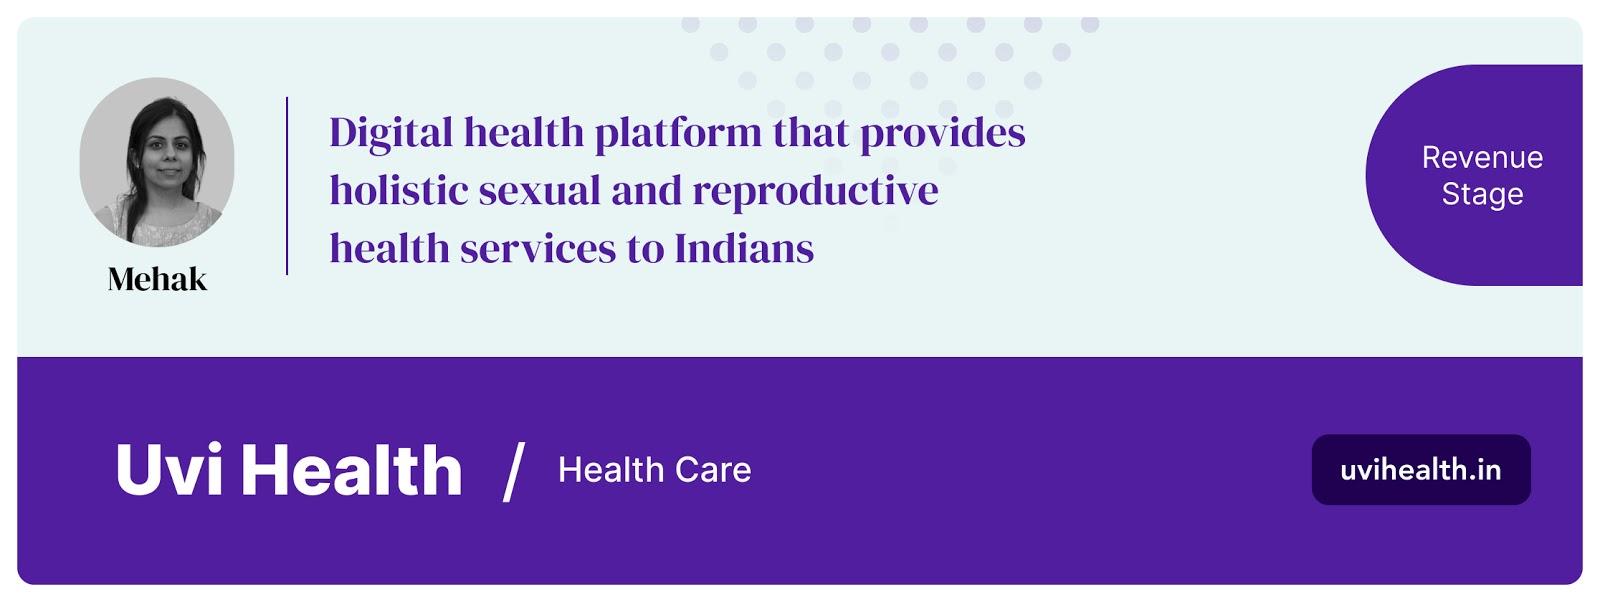 Mehak is building Uvi Health